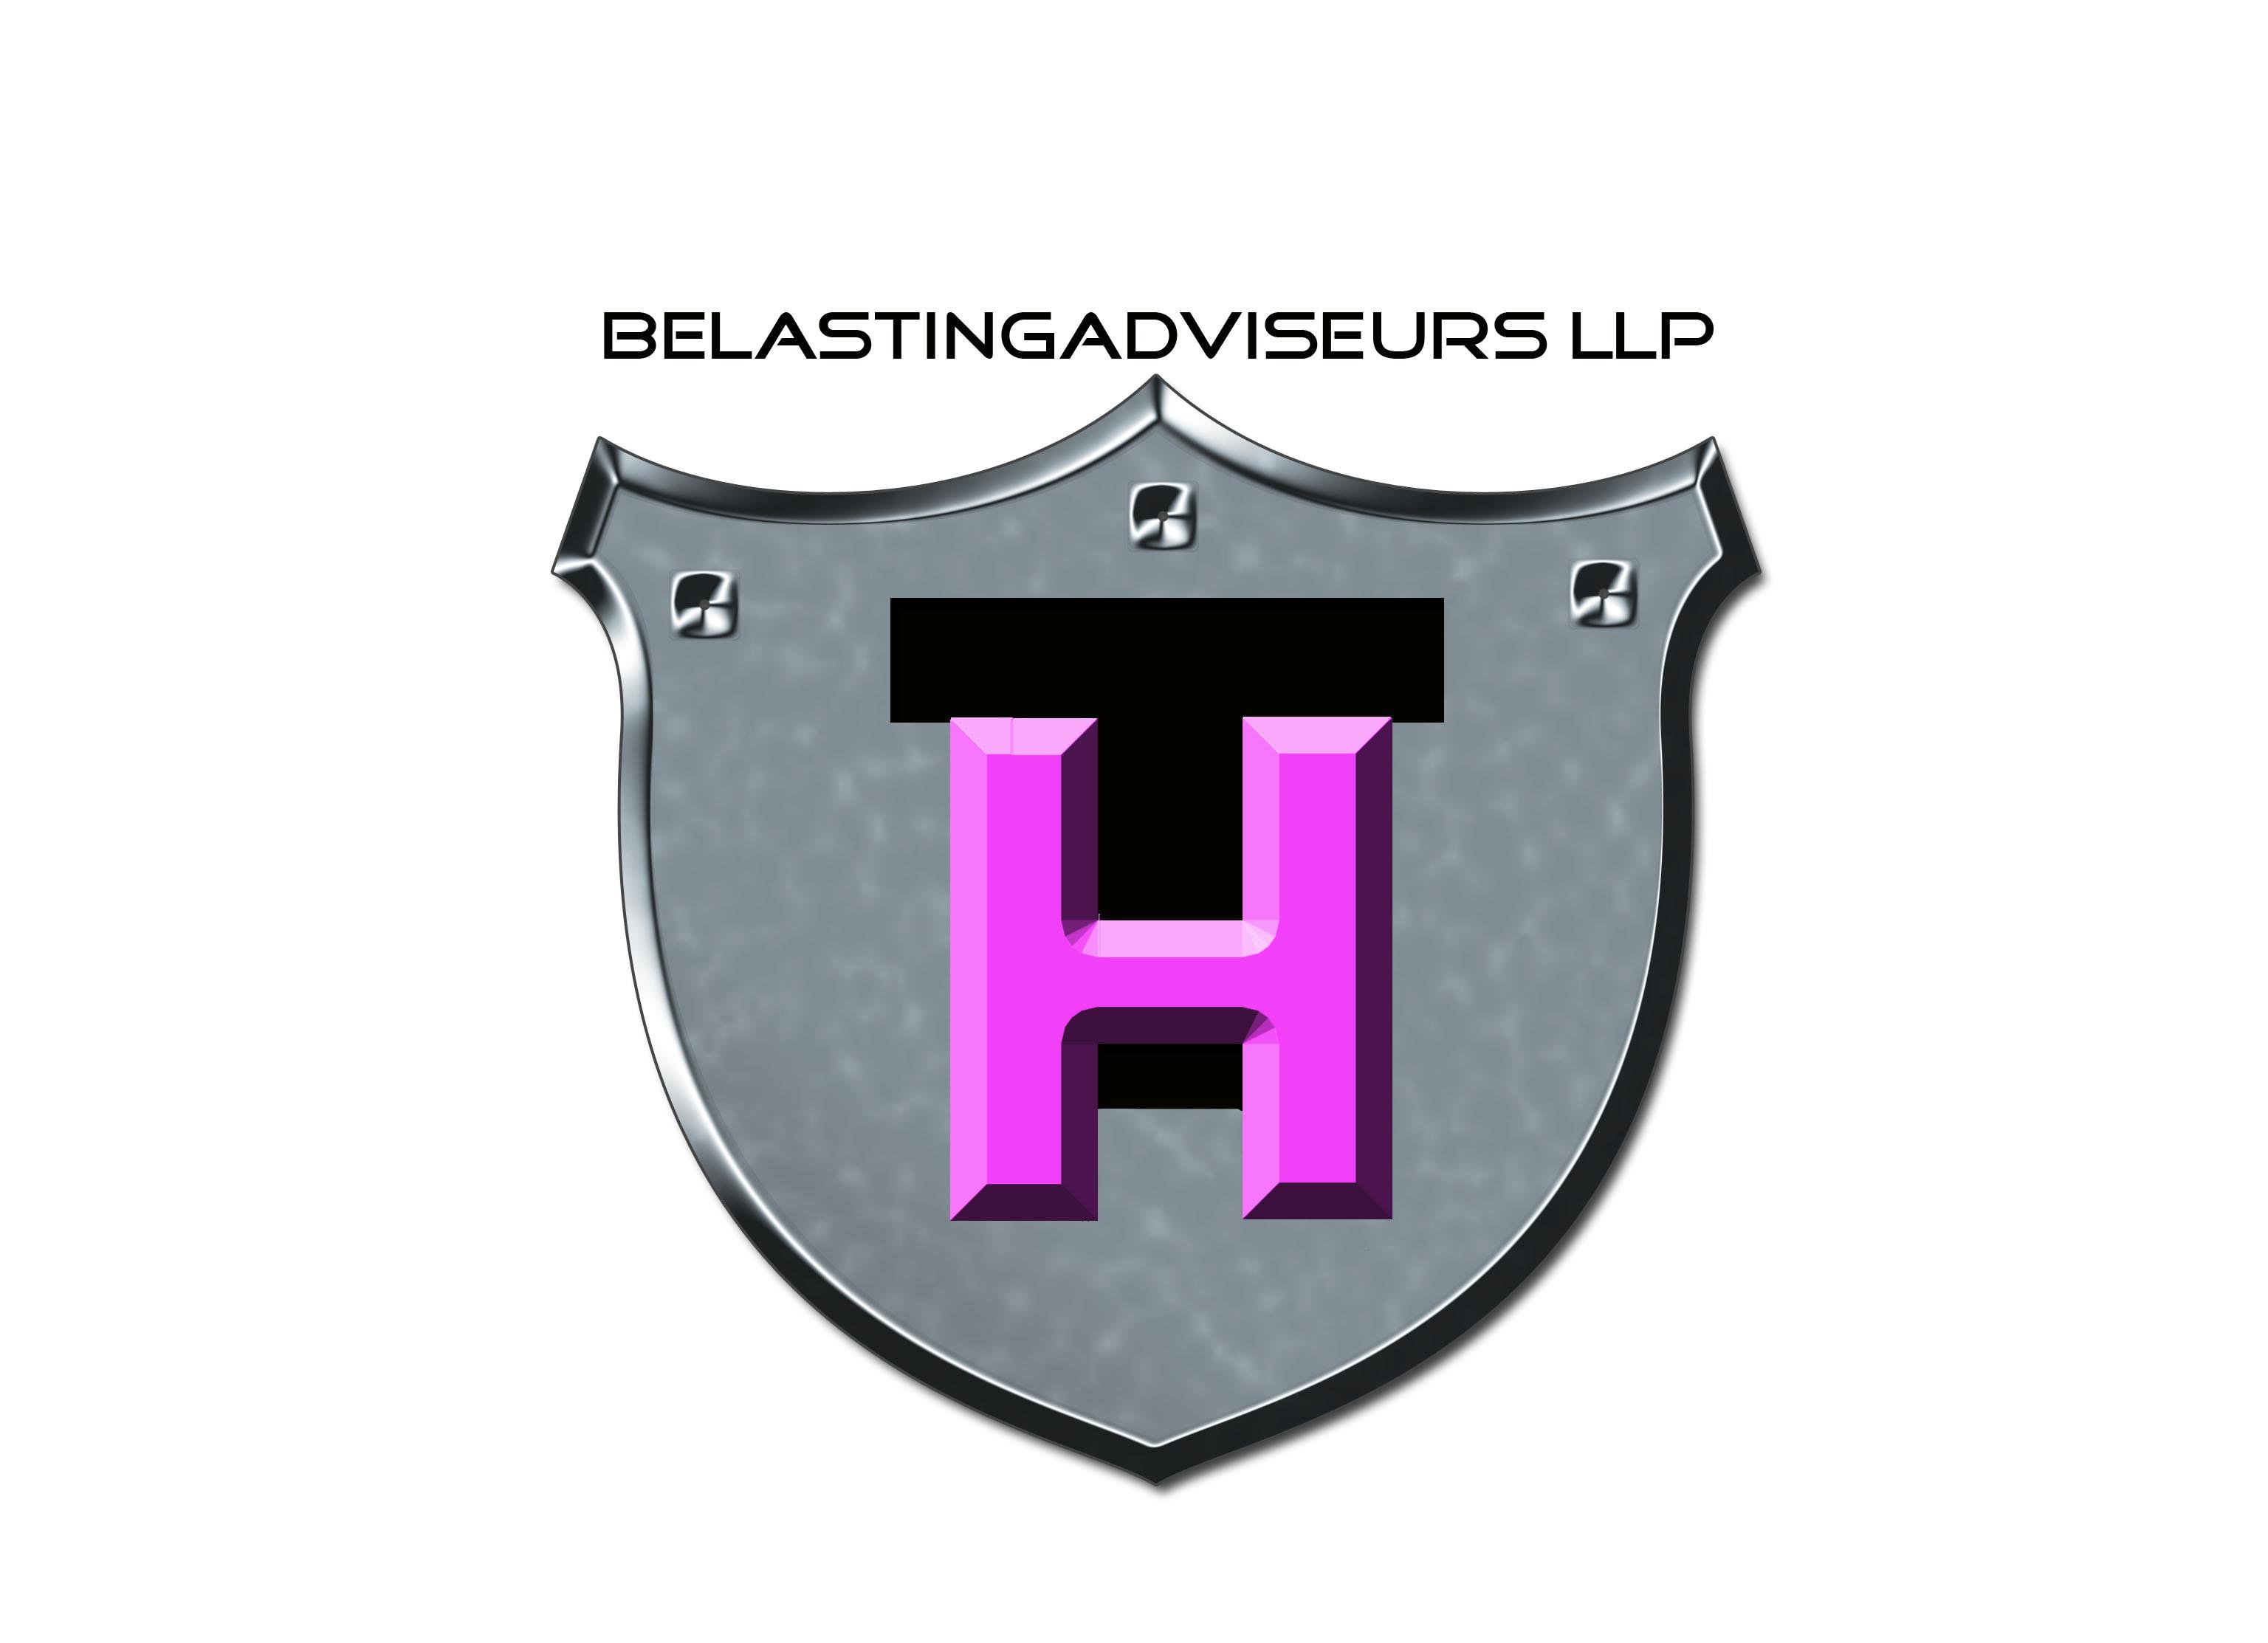 H&T Belastingadviseurs LLP